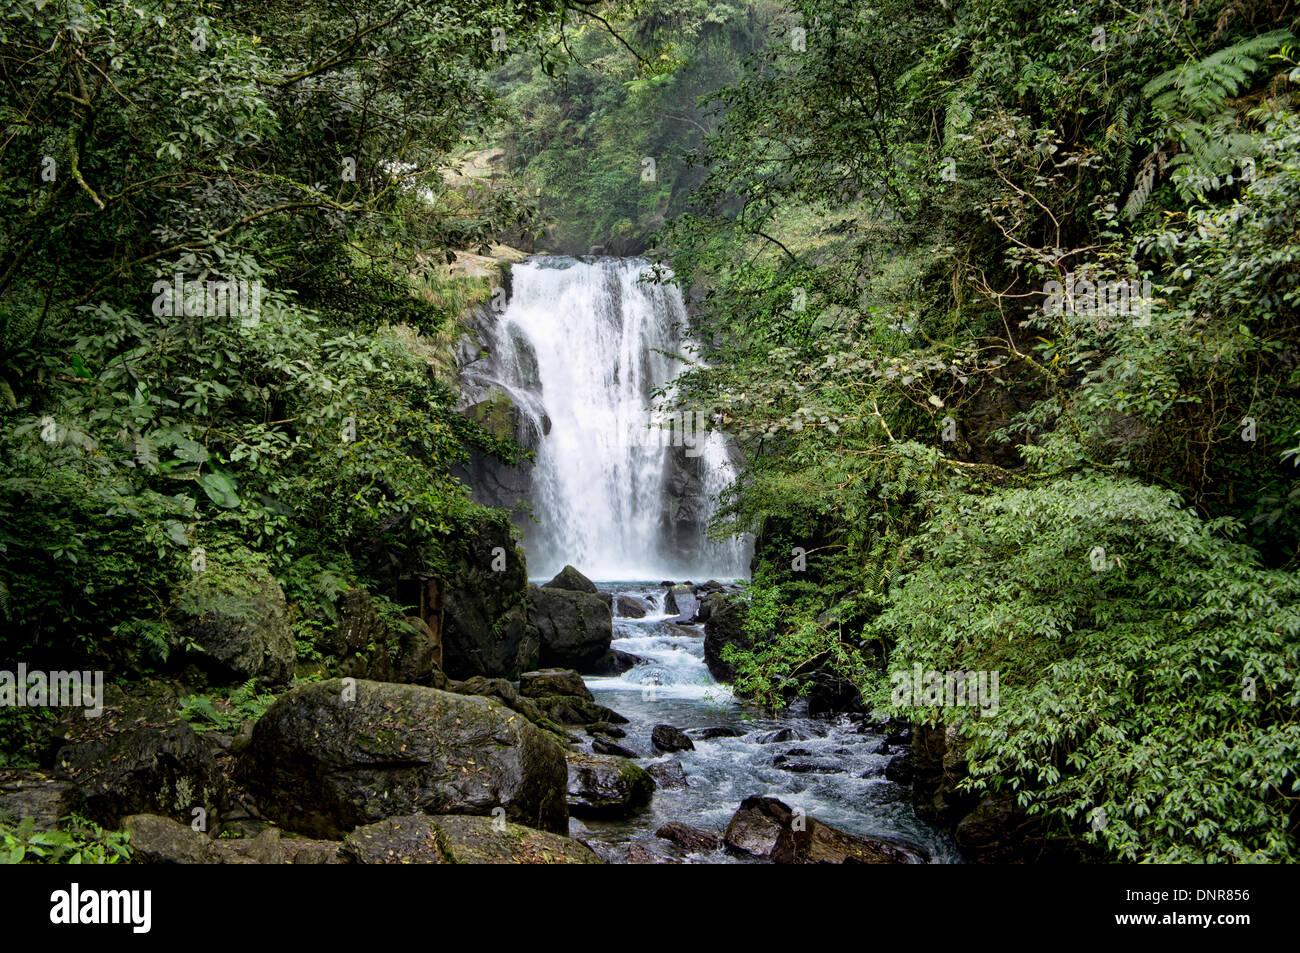 Waterfall in Valley of Wulai, Taiwan - Stock Image